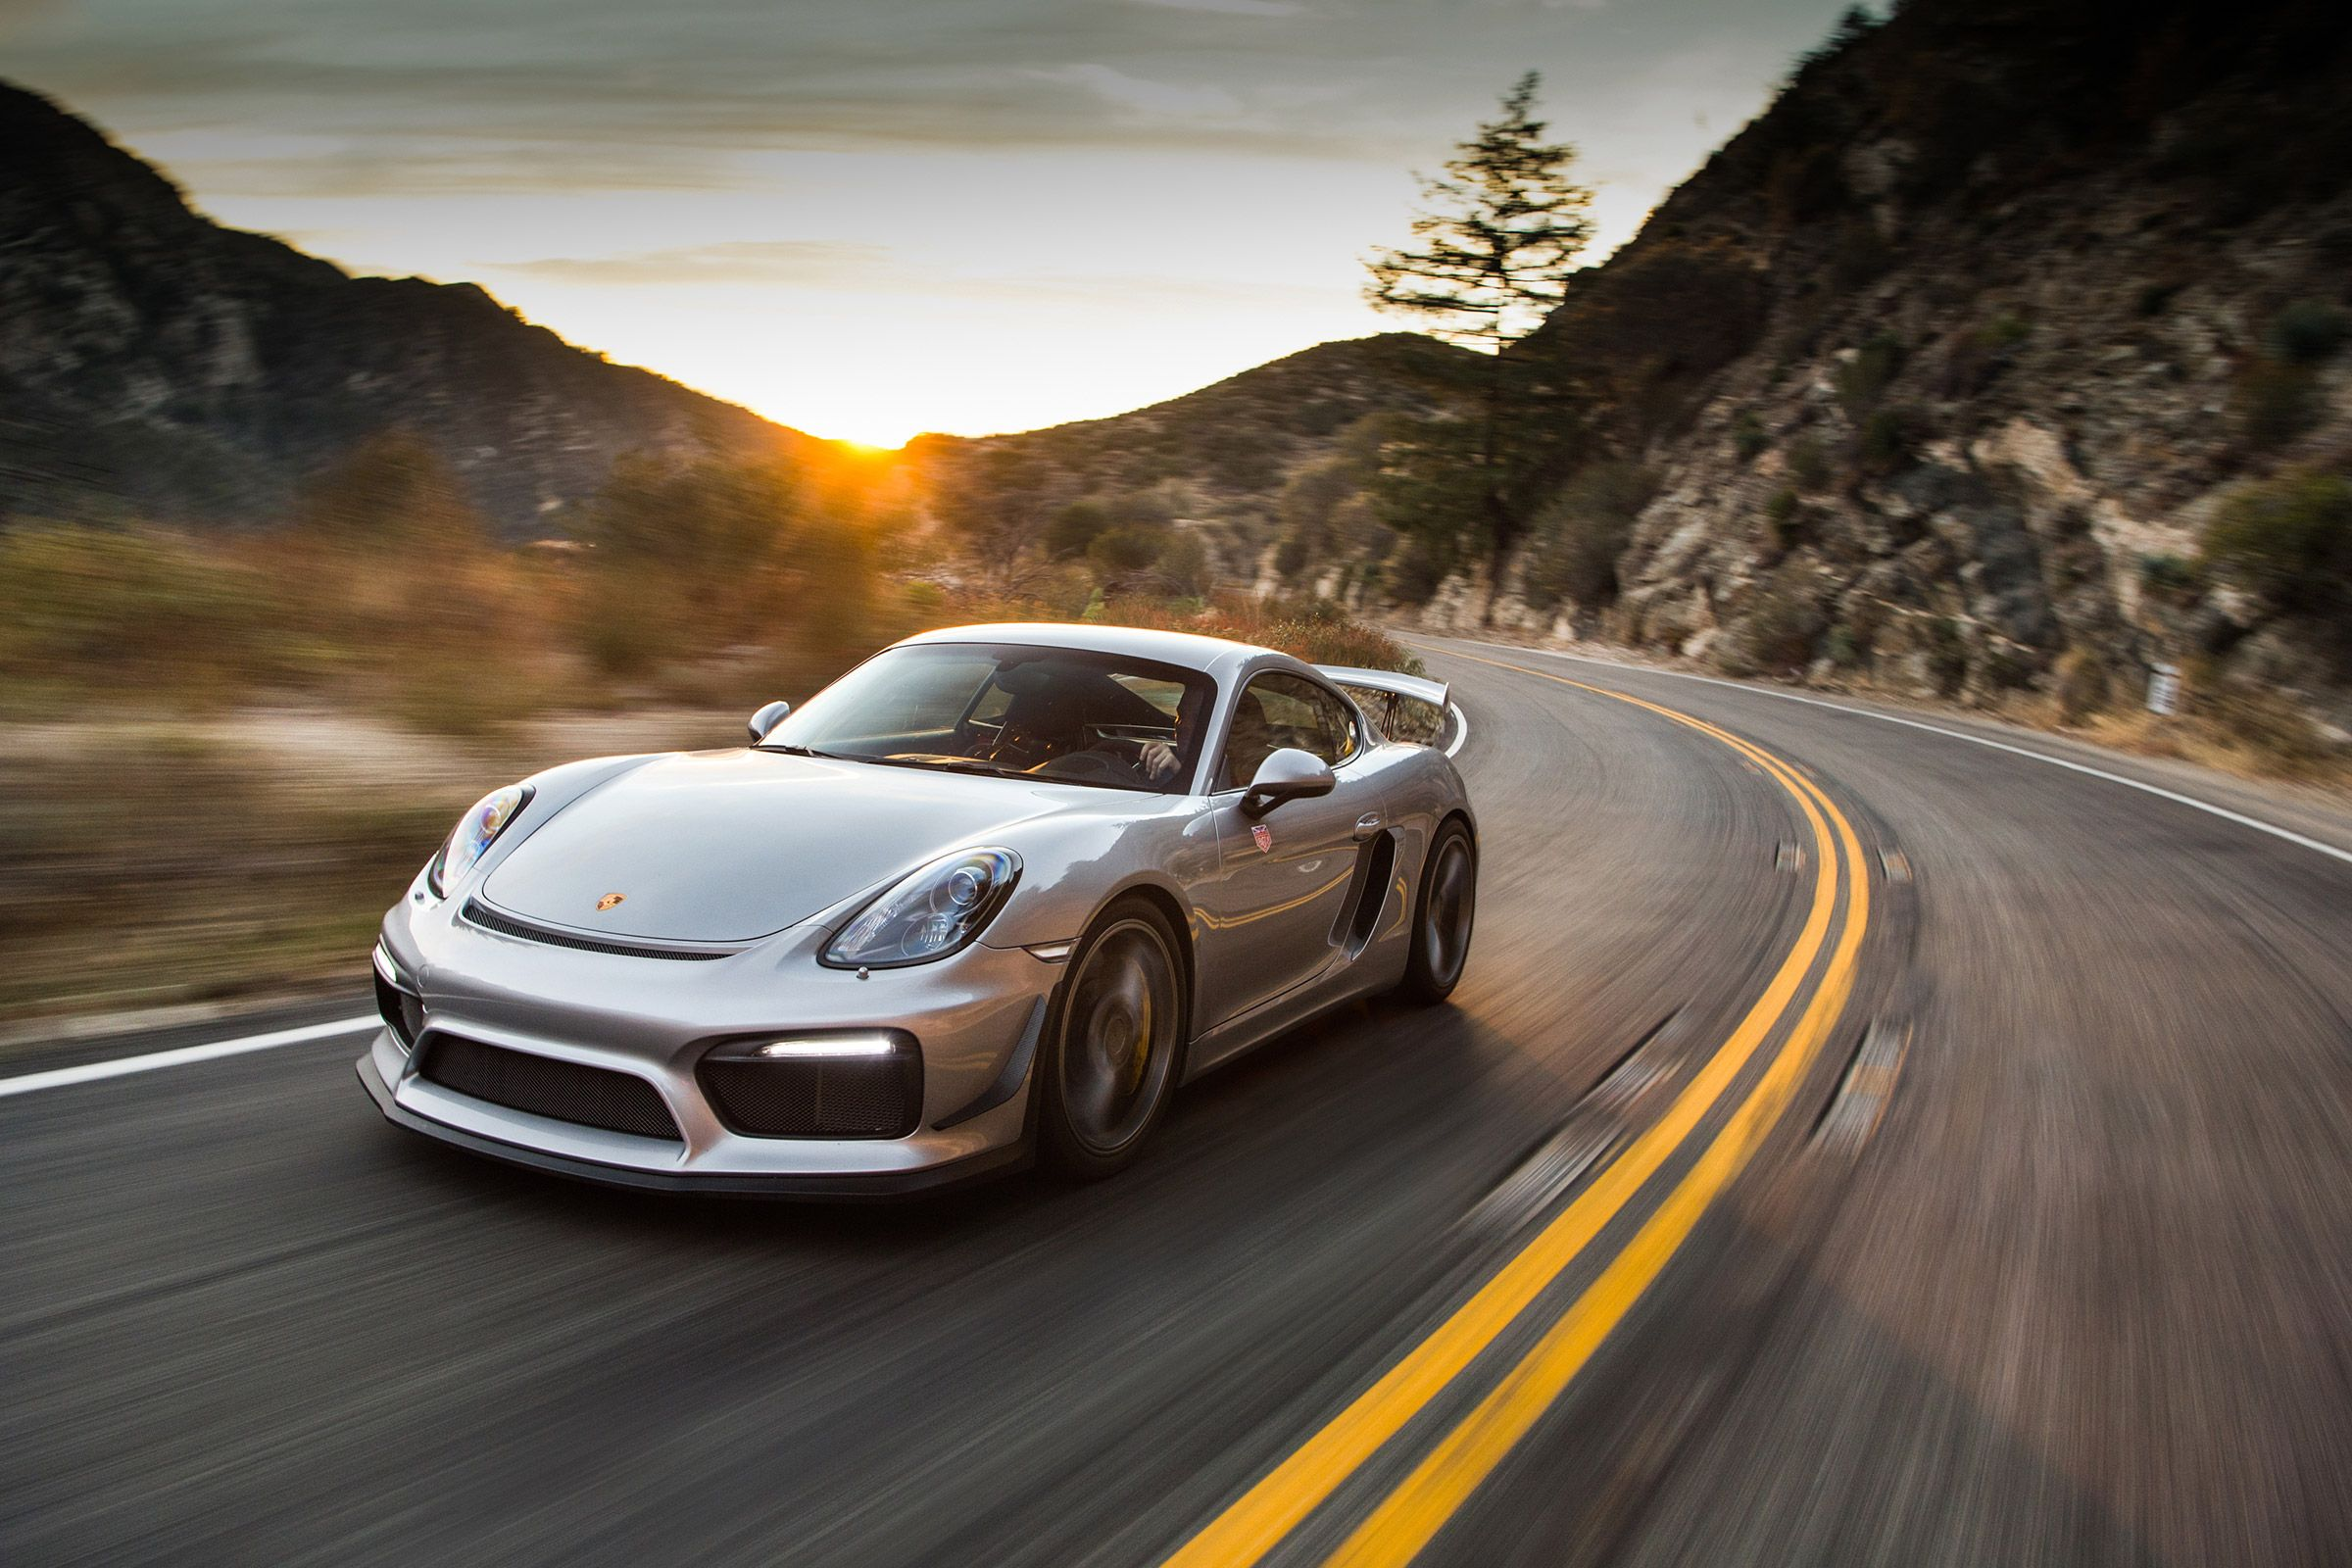 Save Money On Porsche Service We Offer Porsche Repairs And Maintenance Service On 35 Discount Schedule Your Appointment Today Porsche Service Bmw Porsche